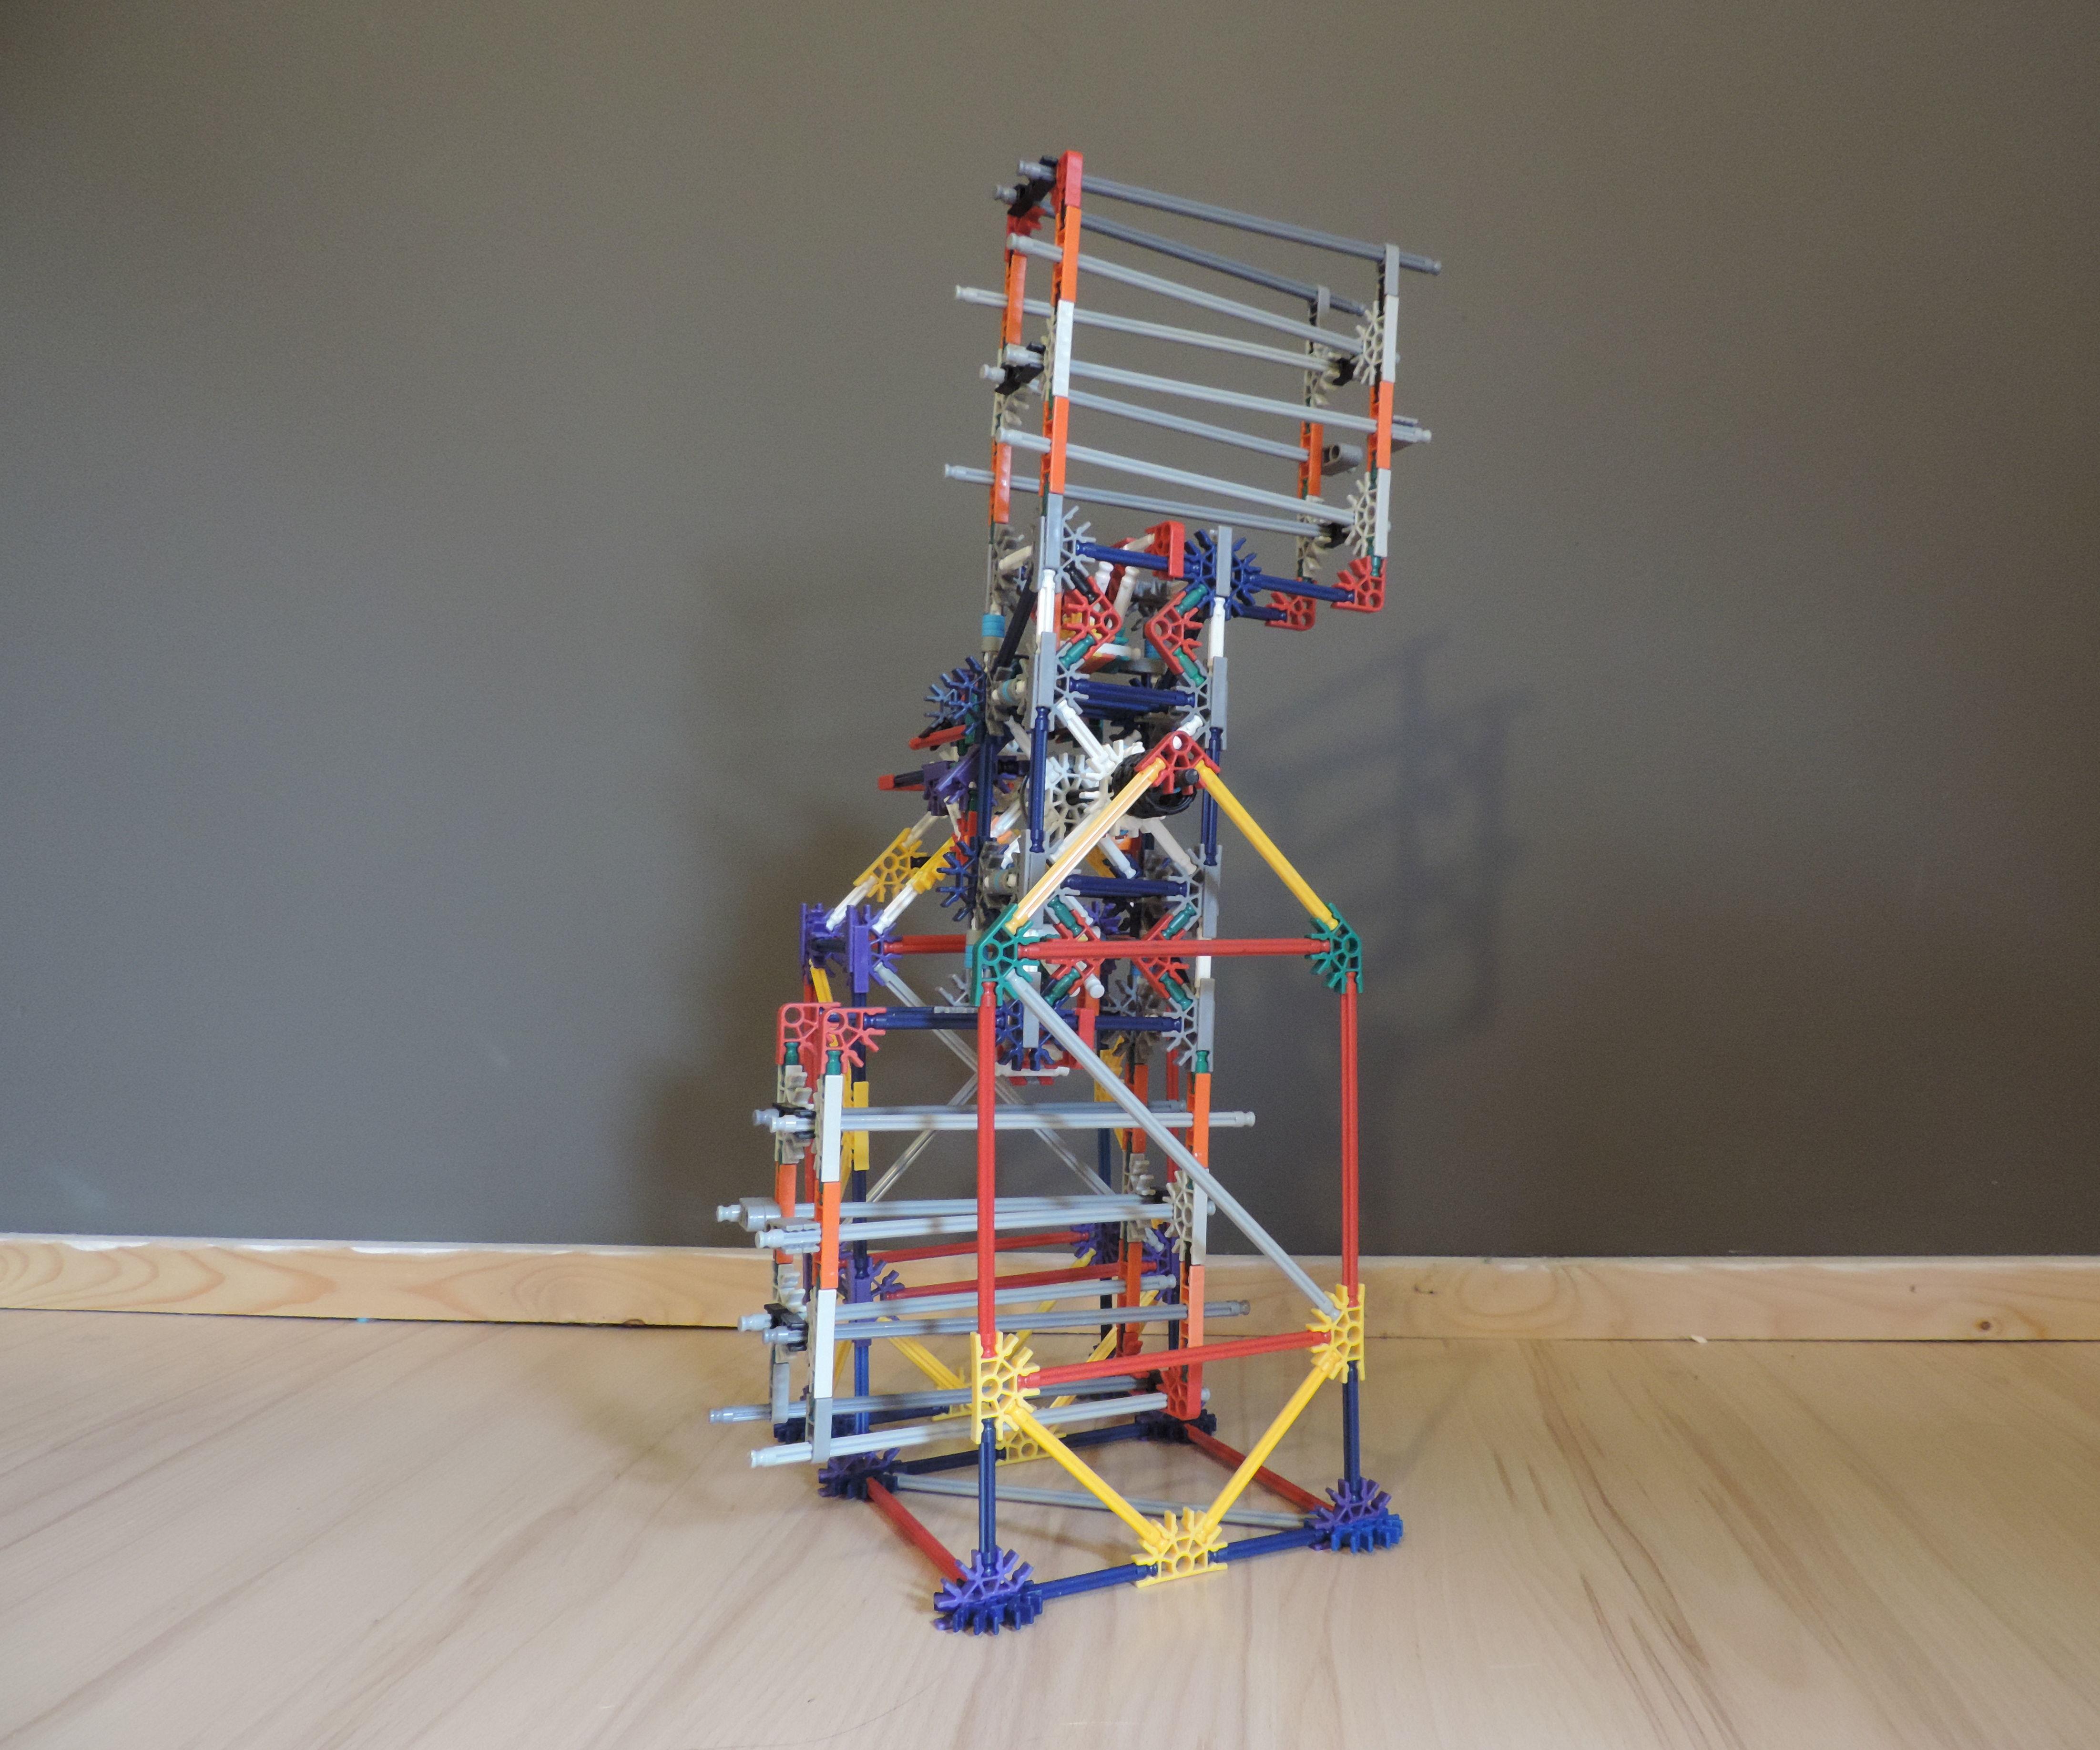 Knex Ball Machine Element: Turning Zig Zags